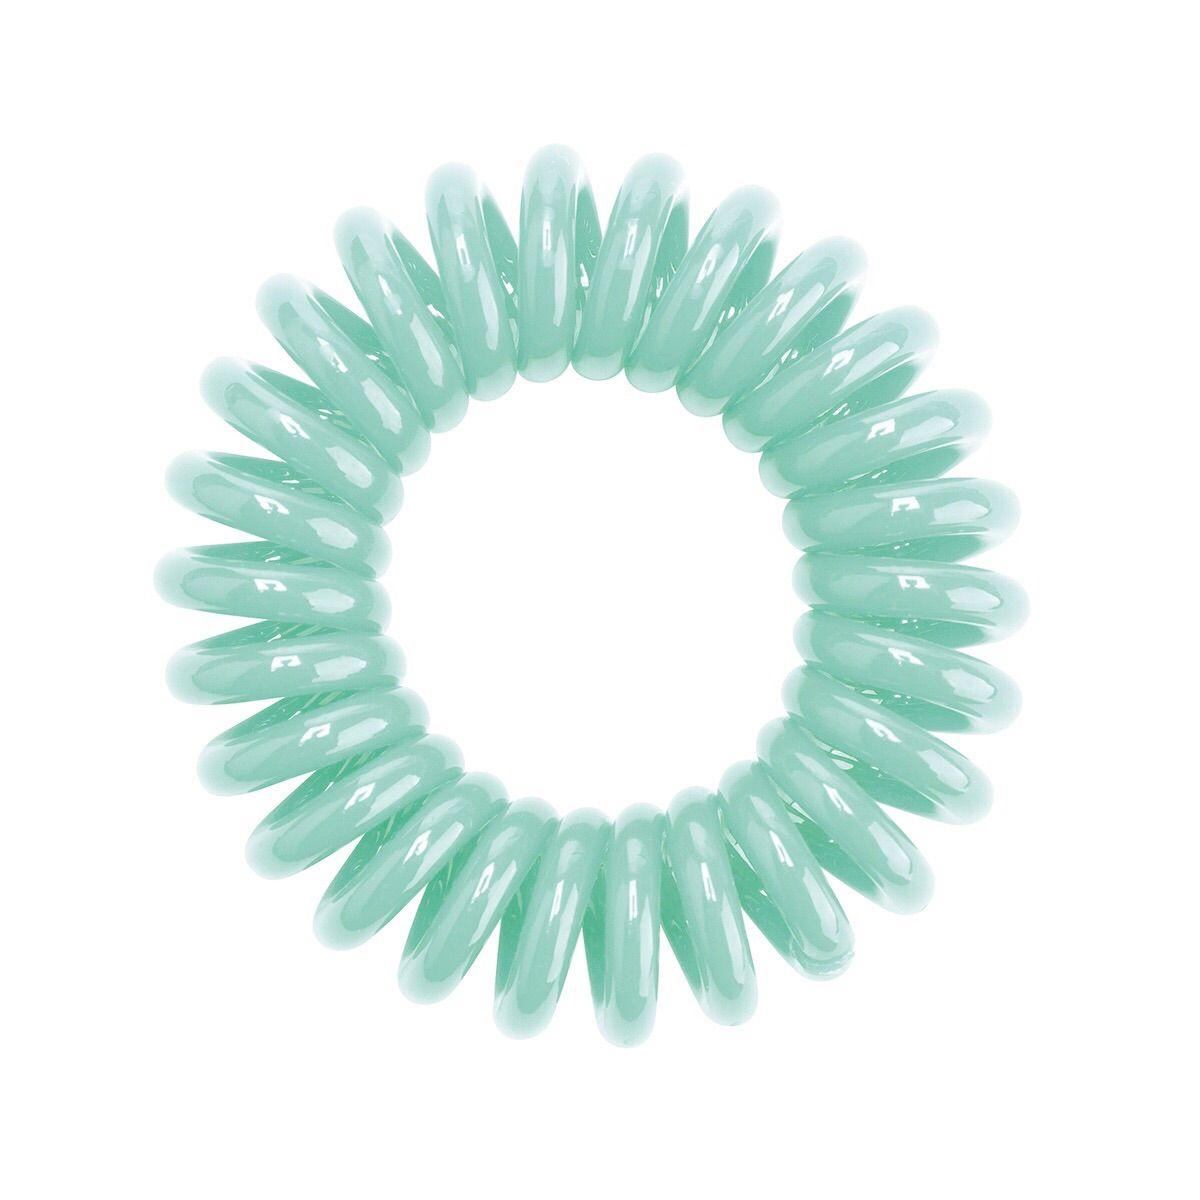 HH Simonsen Hair Bobbles Verde Elastico Per Capelli - 1 PZ